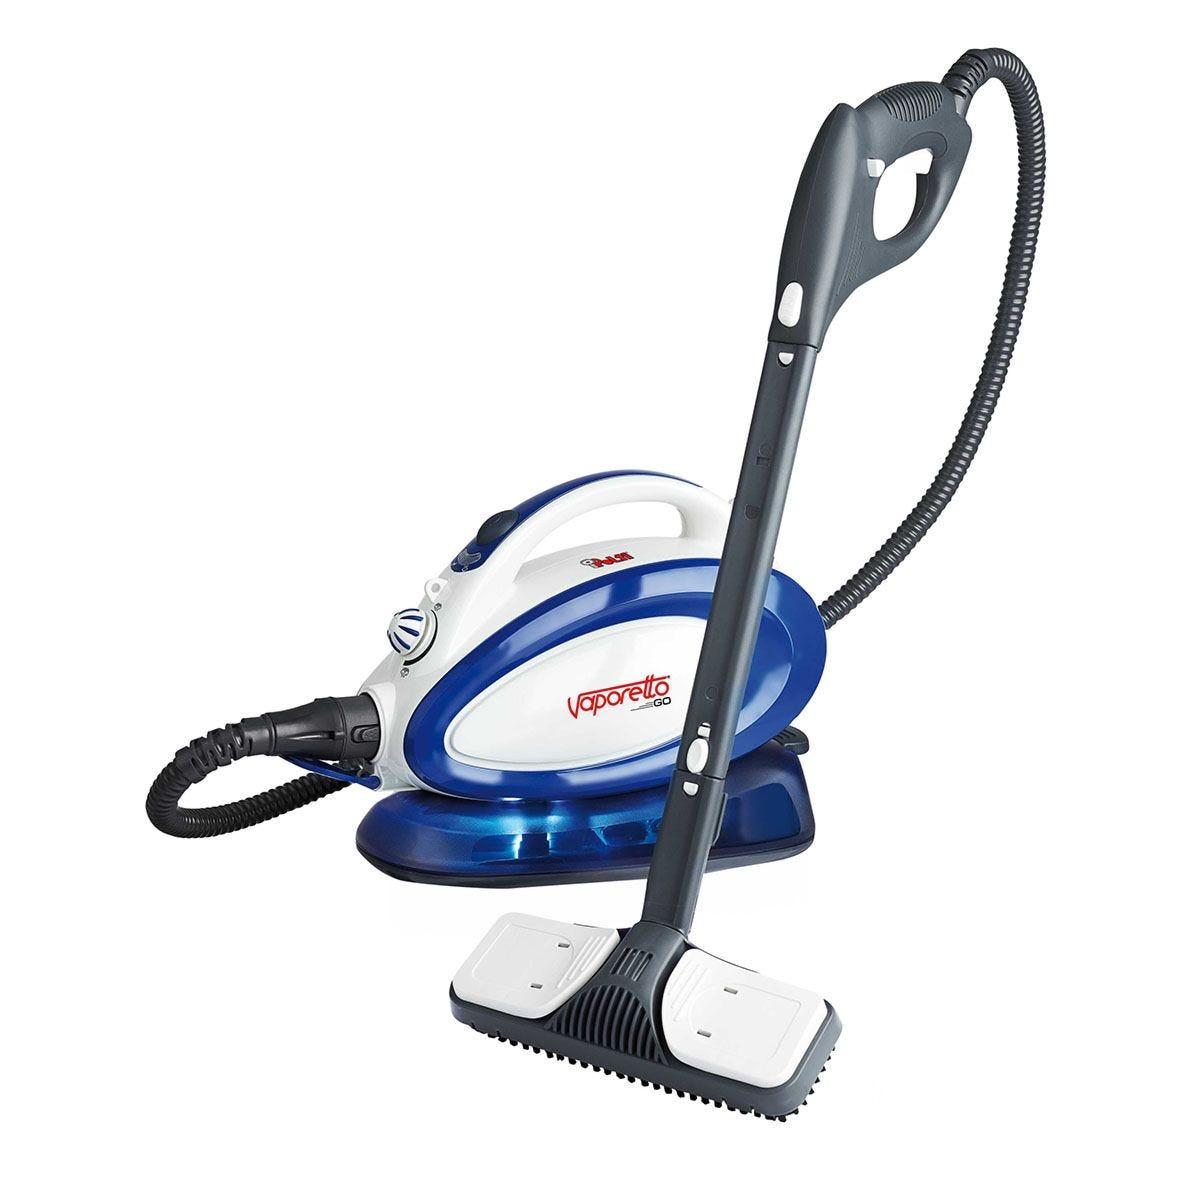 Polti Vaporetto Handy Go Steam Mop - White & Blue